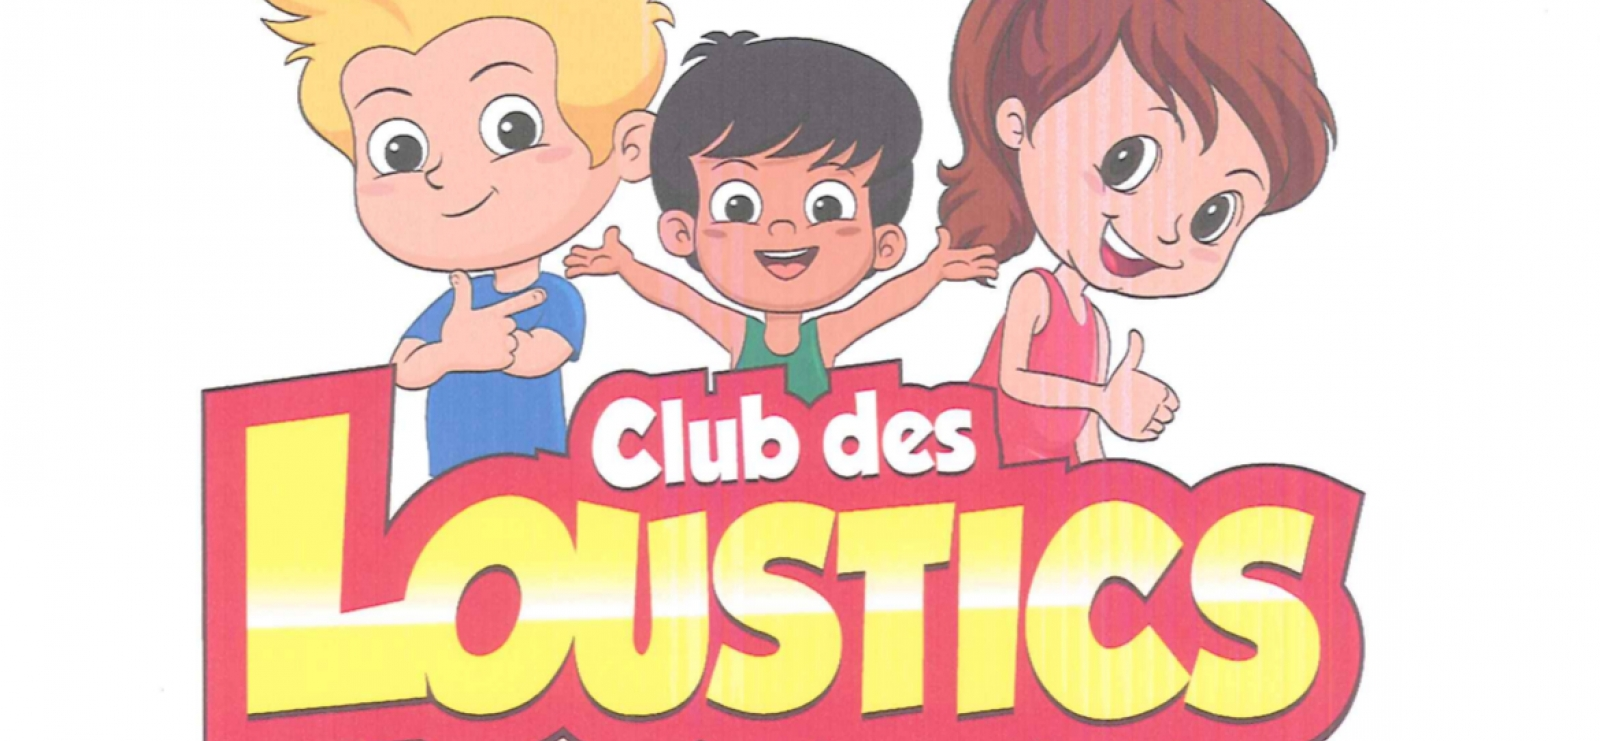 Club Mickey d'Agay - Les Loustics